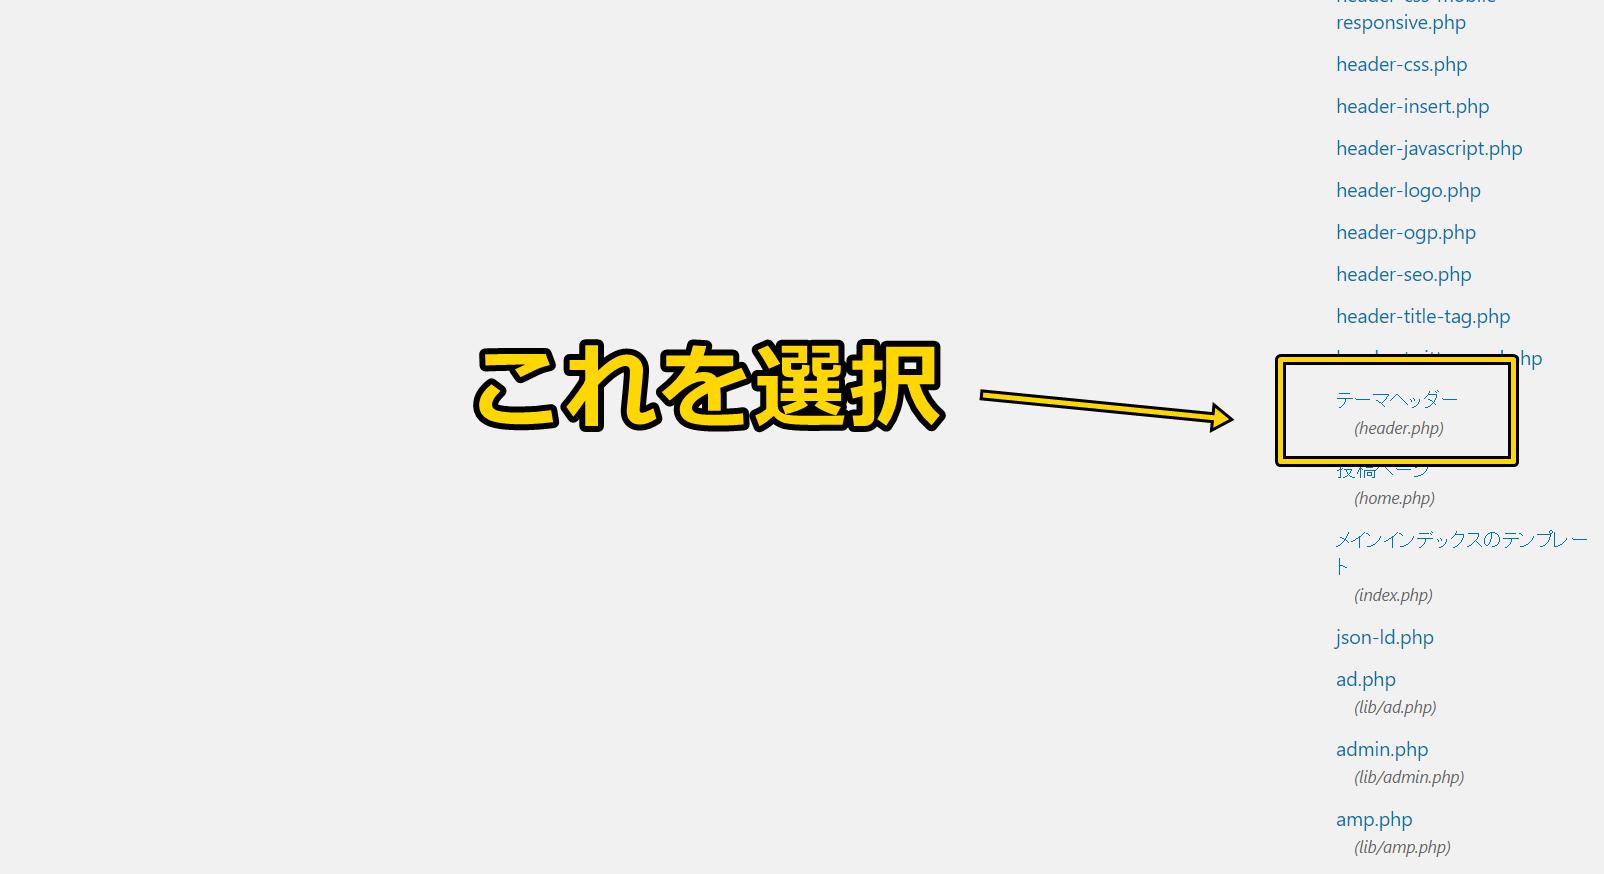 adshinsei5